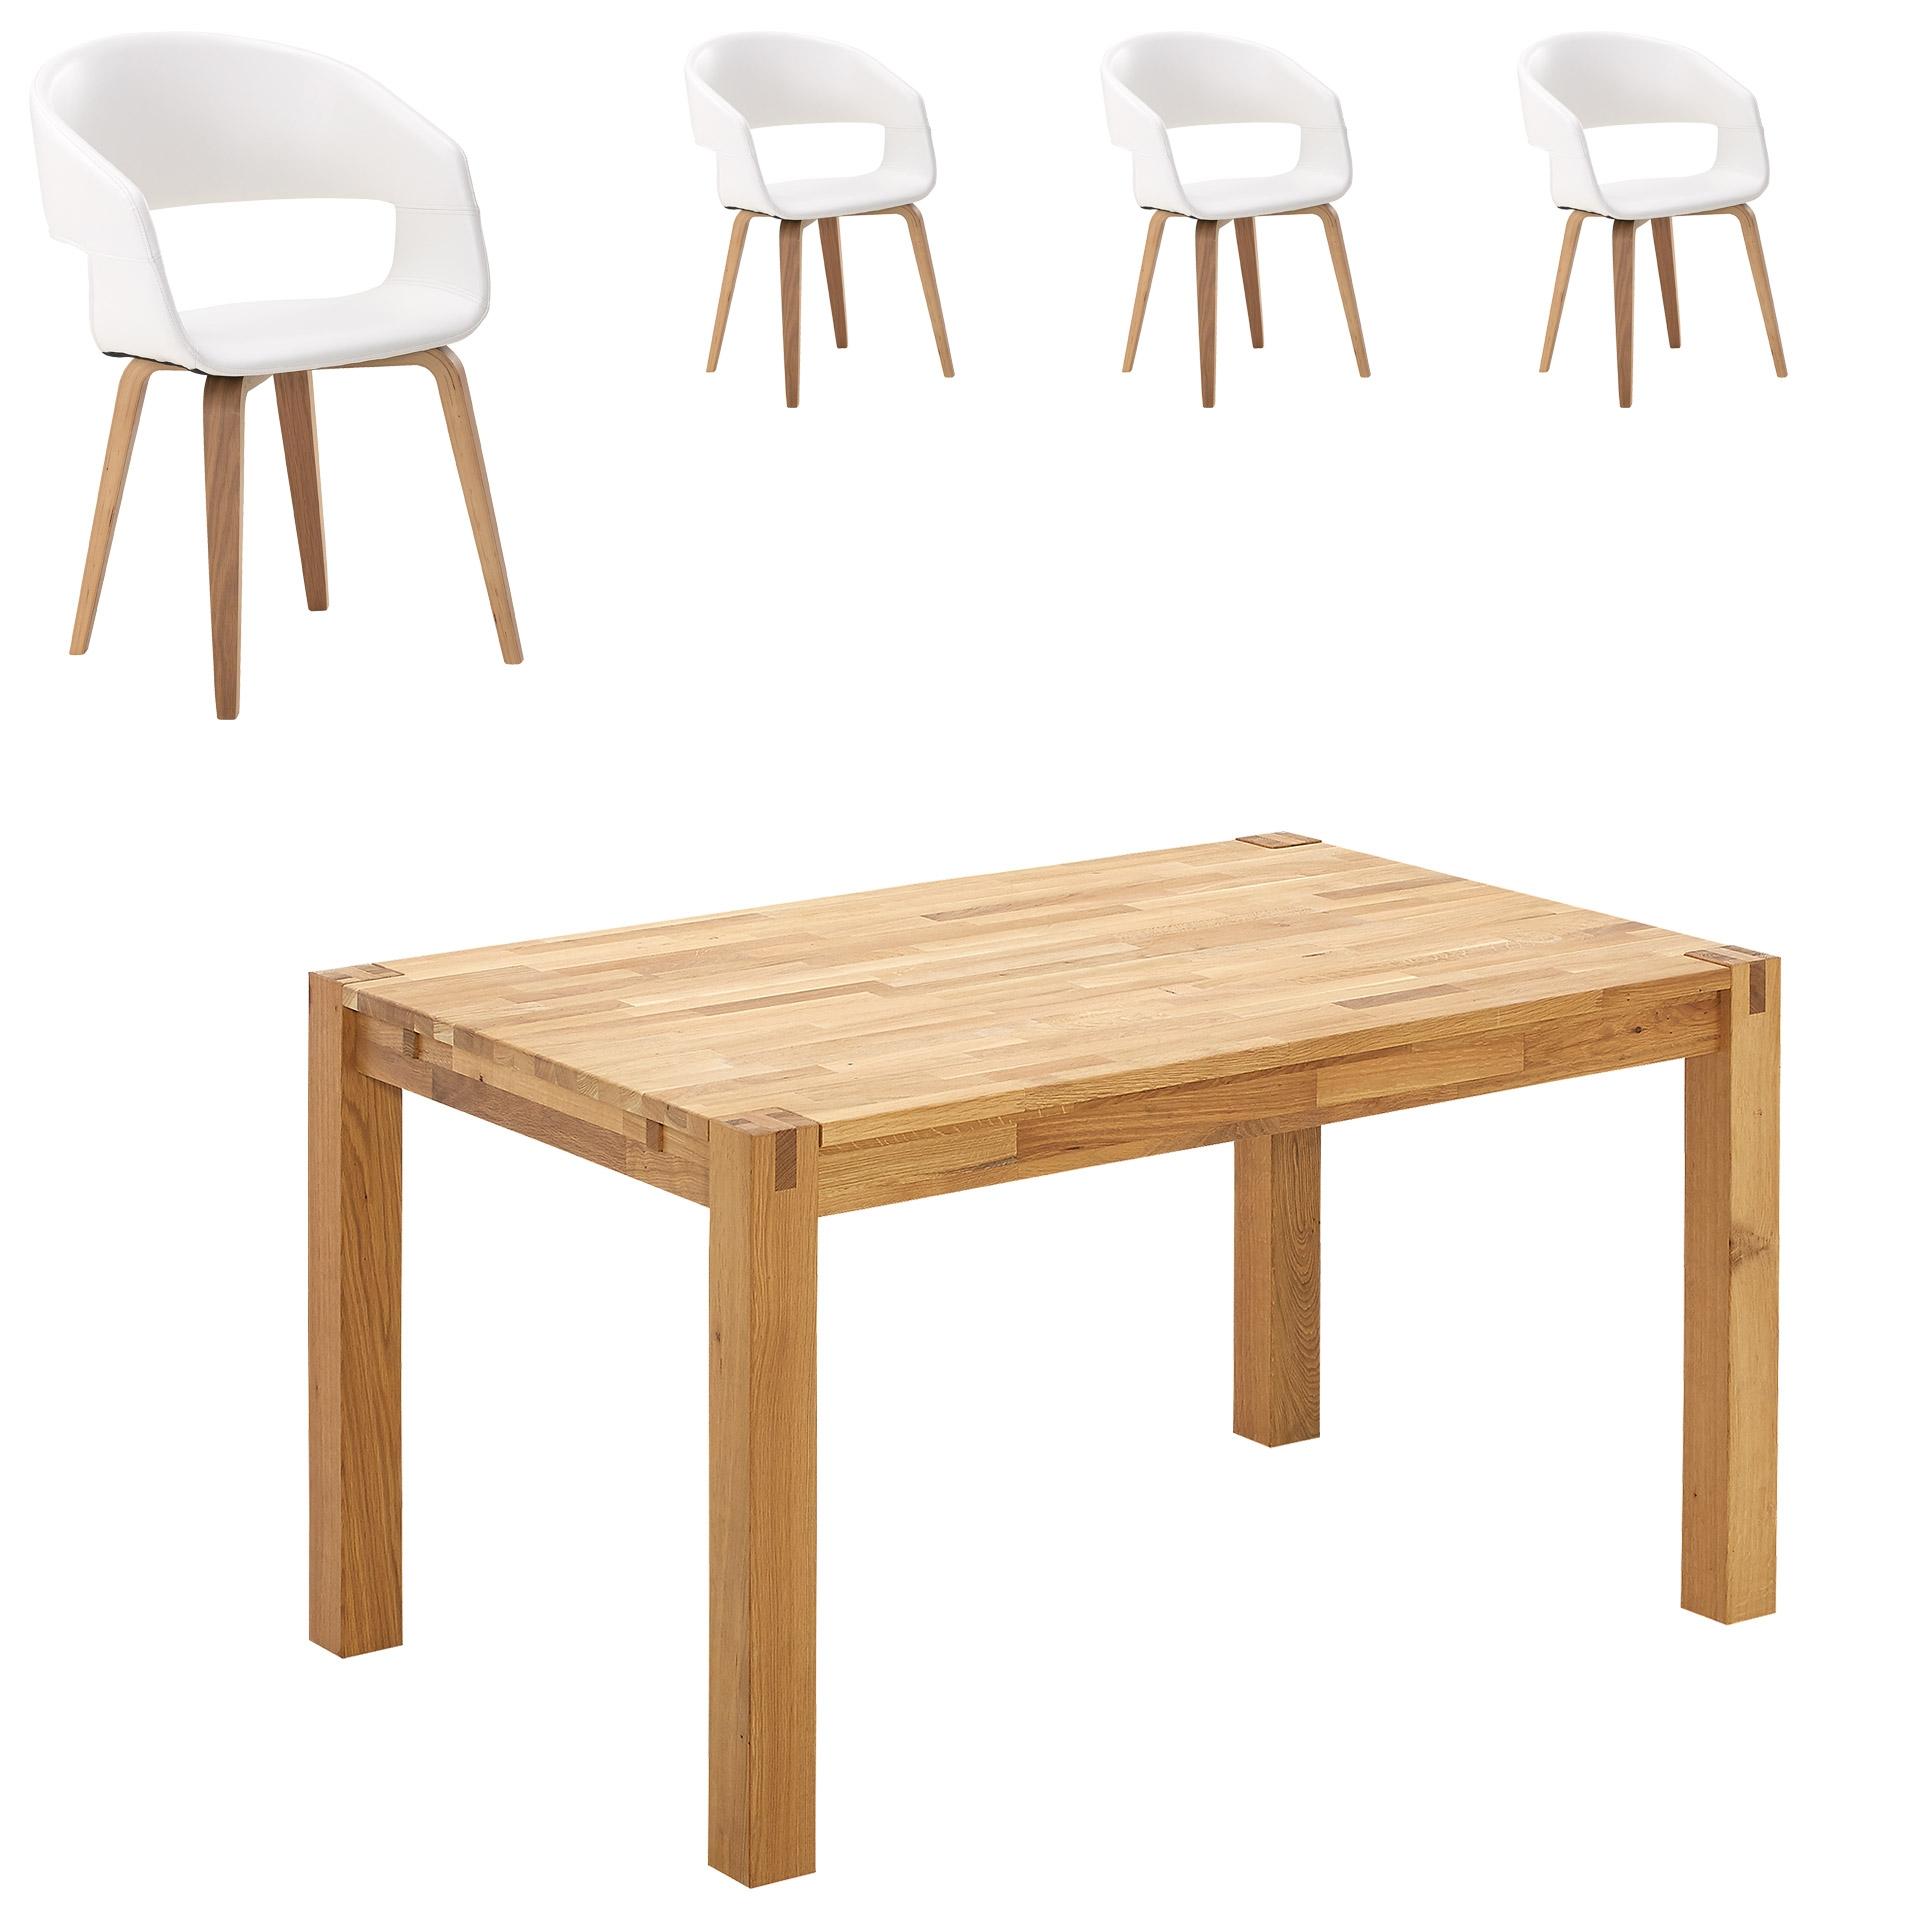 Essgruppe Royal Oak/Holstebro (140x90, 4 Stühle, weiß)